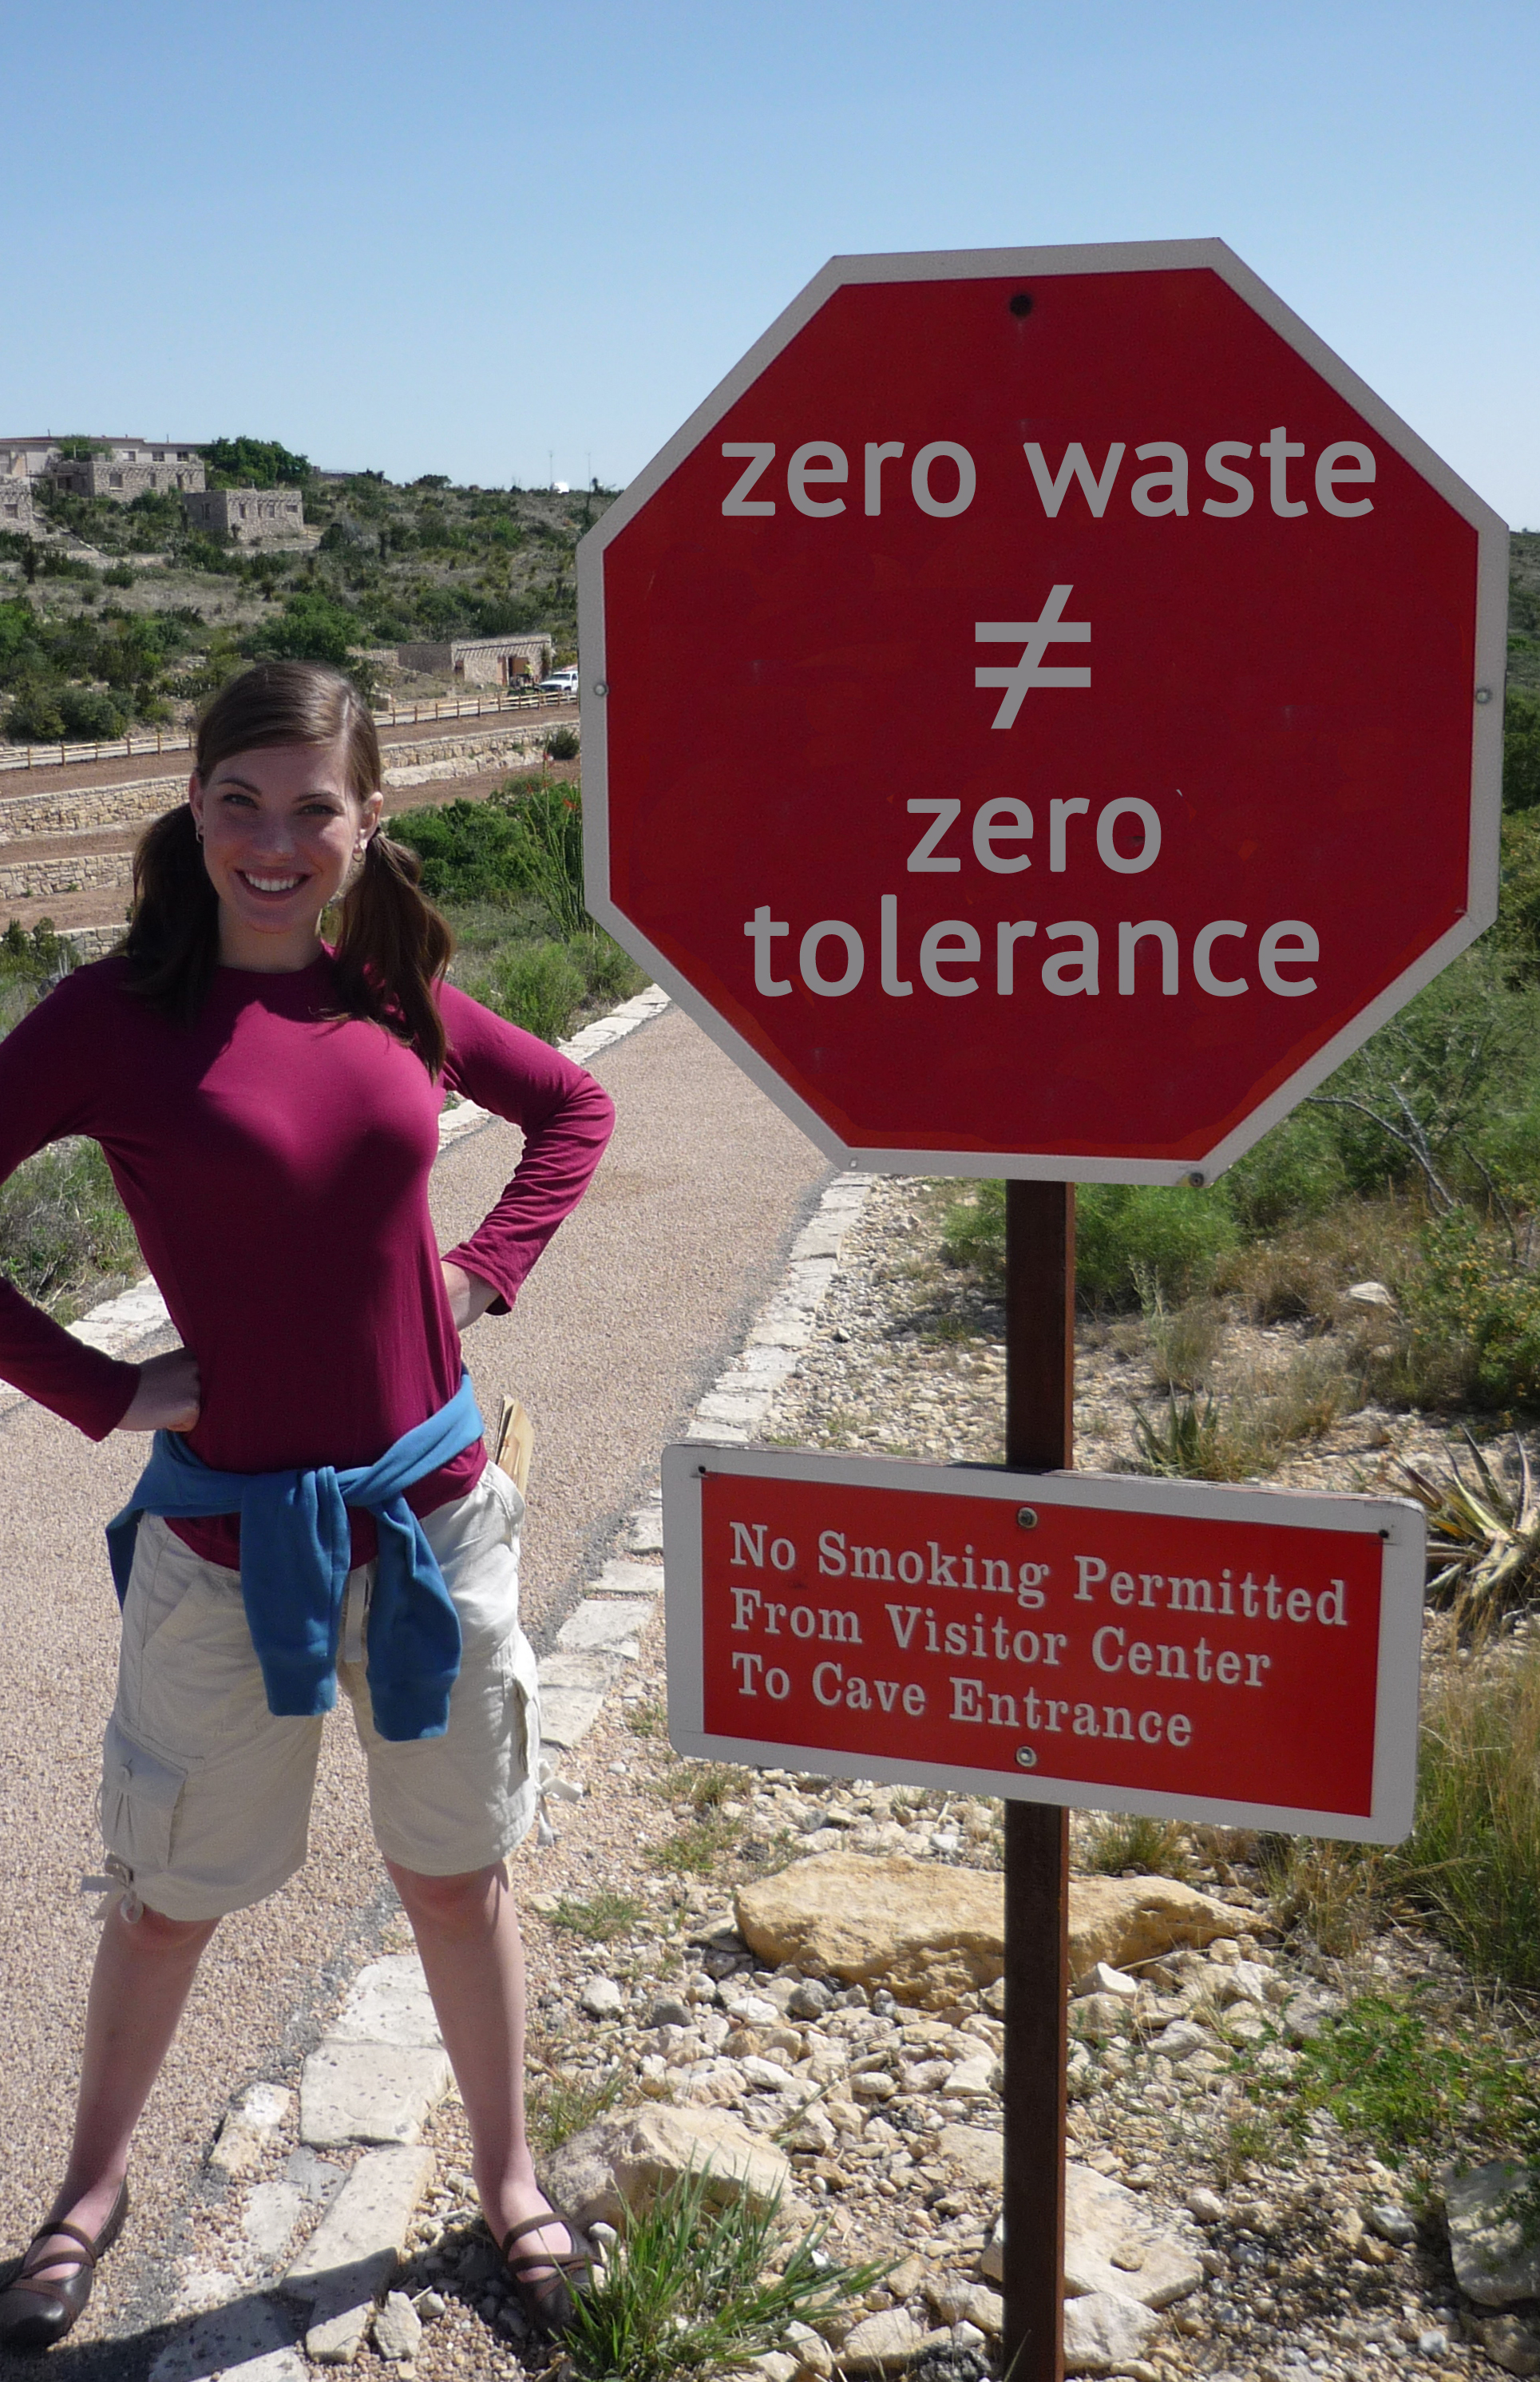 zero waste does not equal zero tolerance from goingzerowaste.com